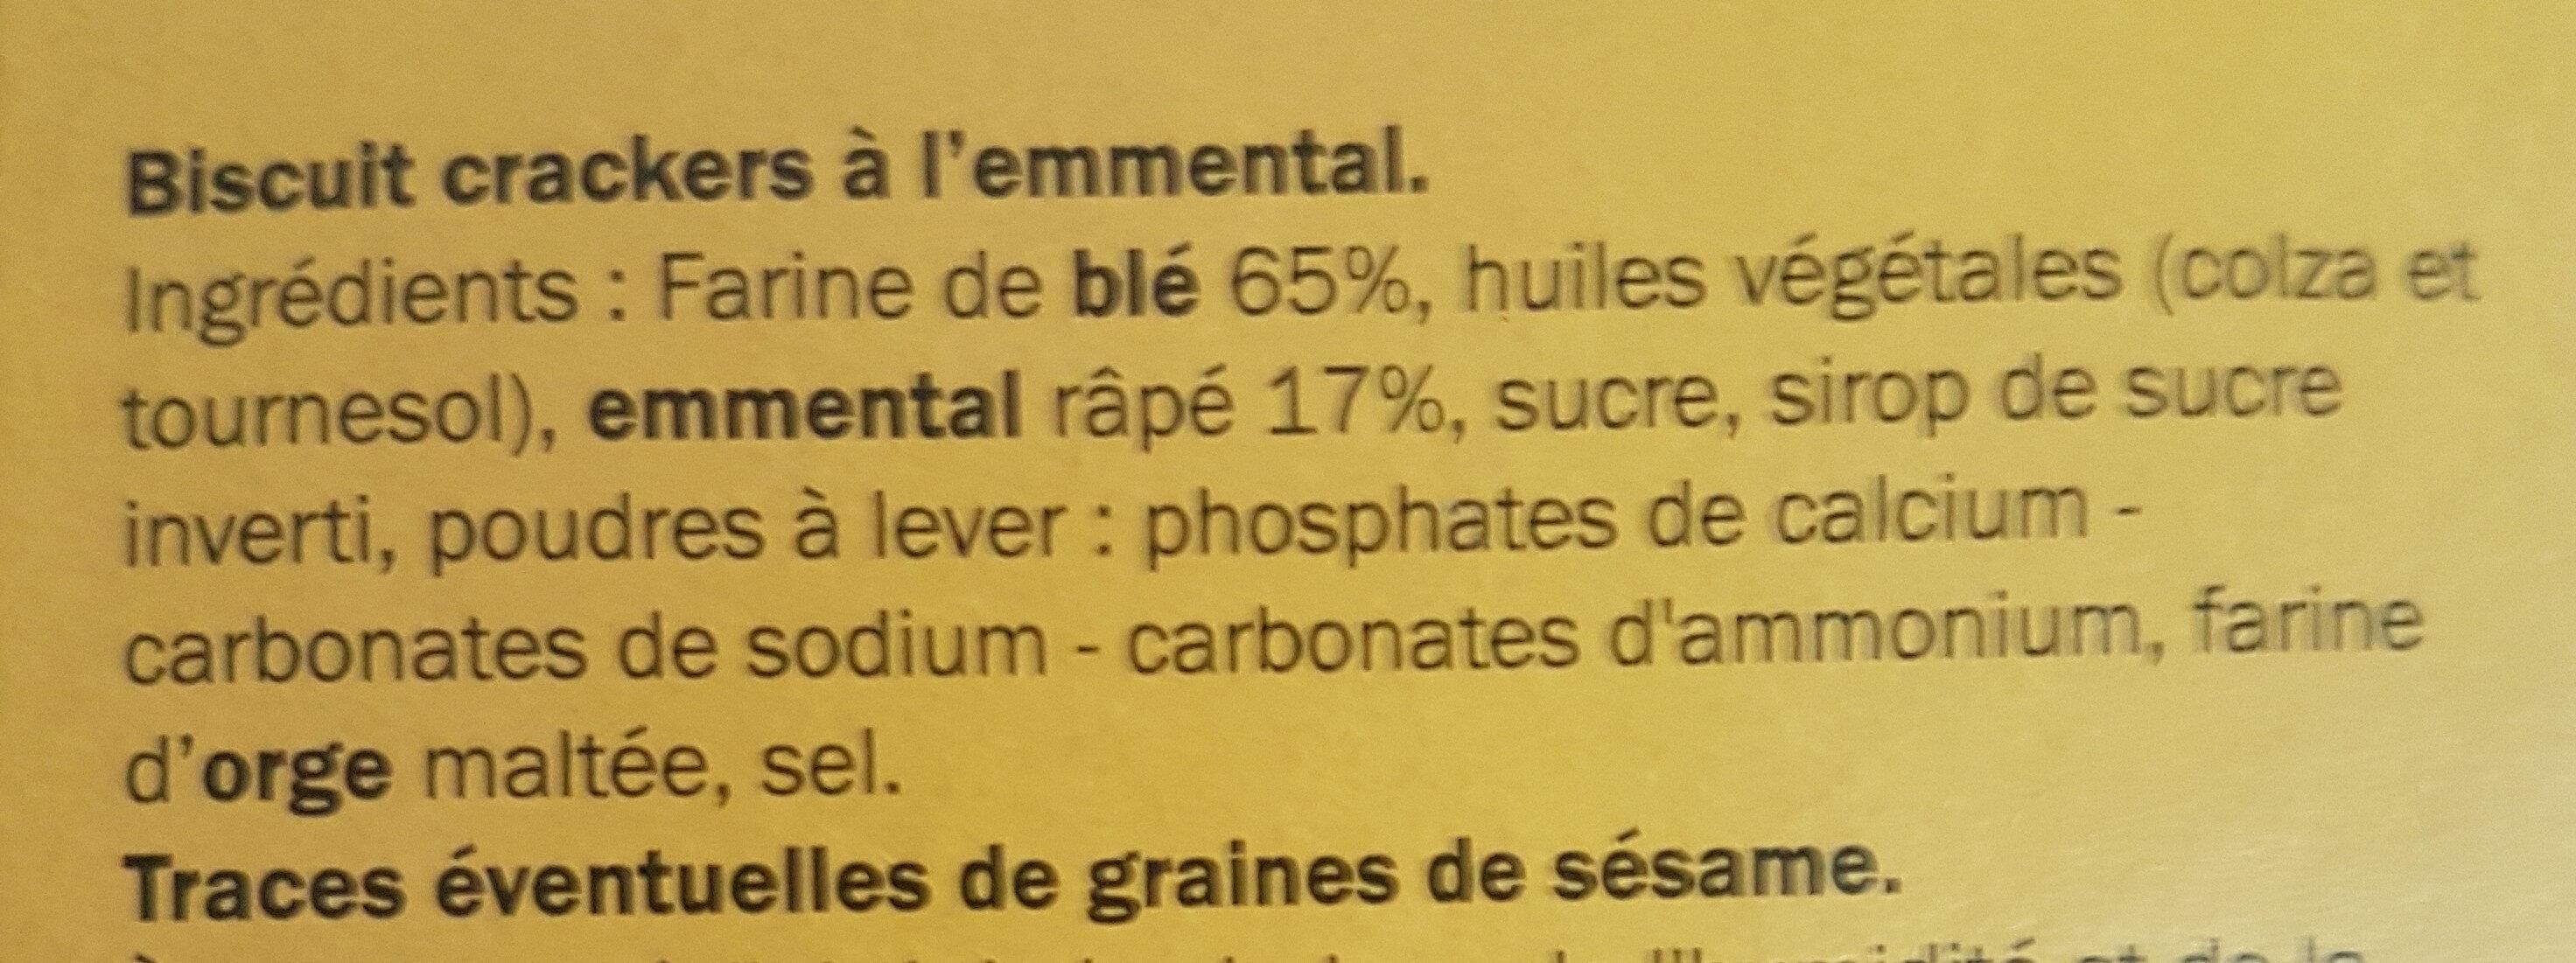 Witti's à l'emmental - Ingrediënten